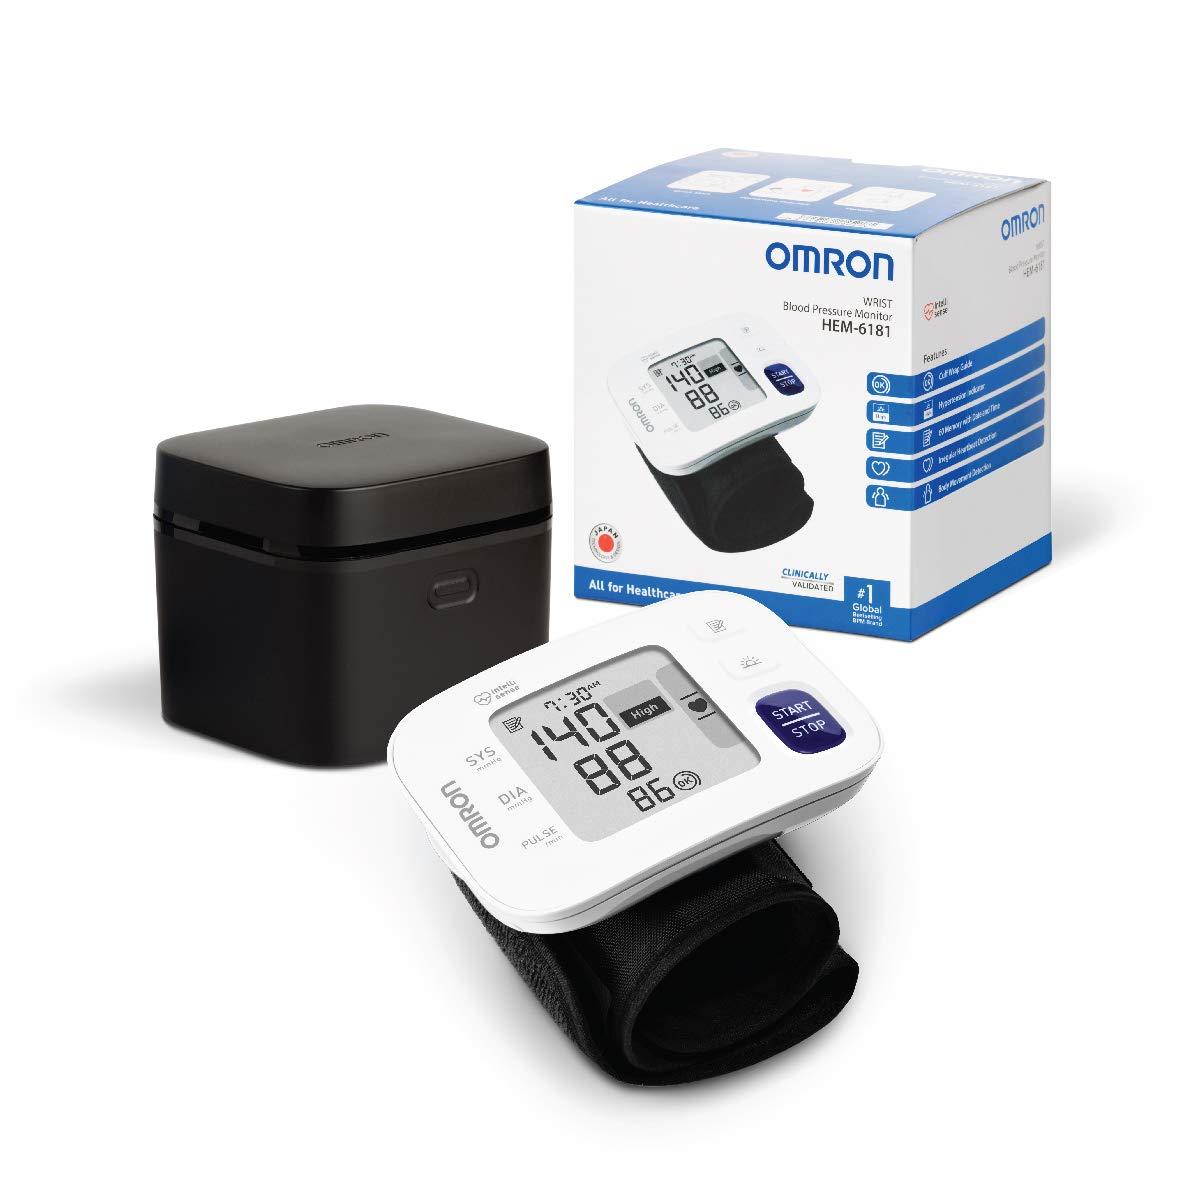 omron-rs4-wrist-blood-pressure-monitor-hem-6181-kuwait-online